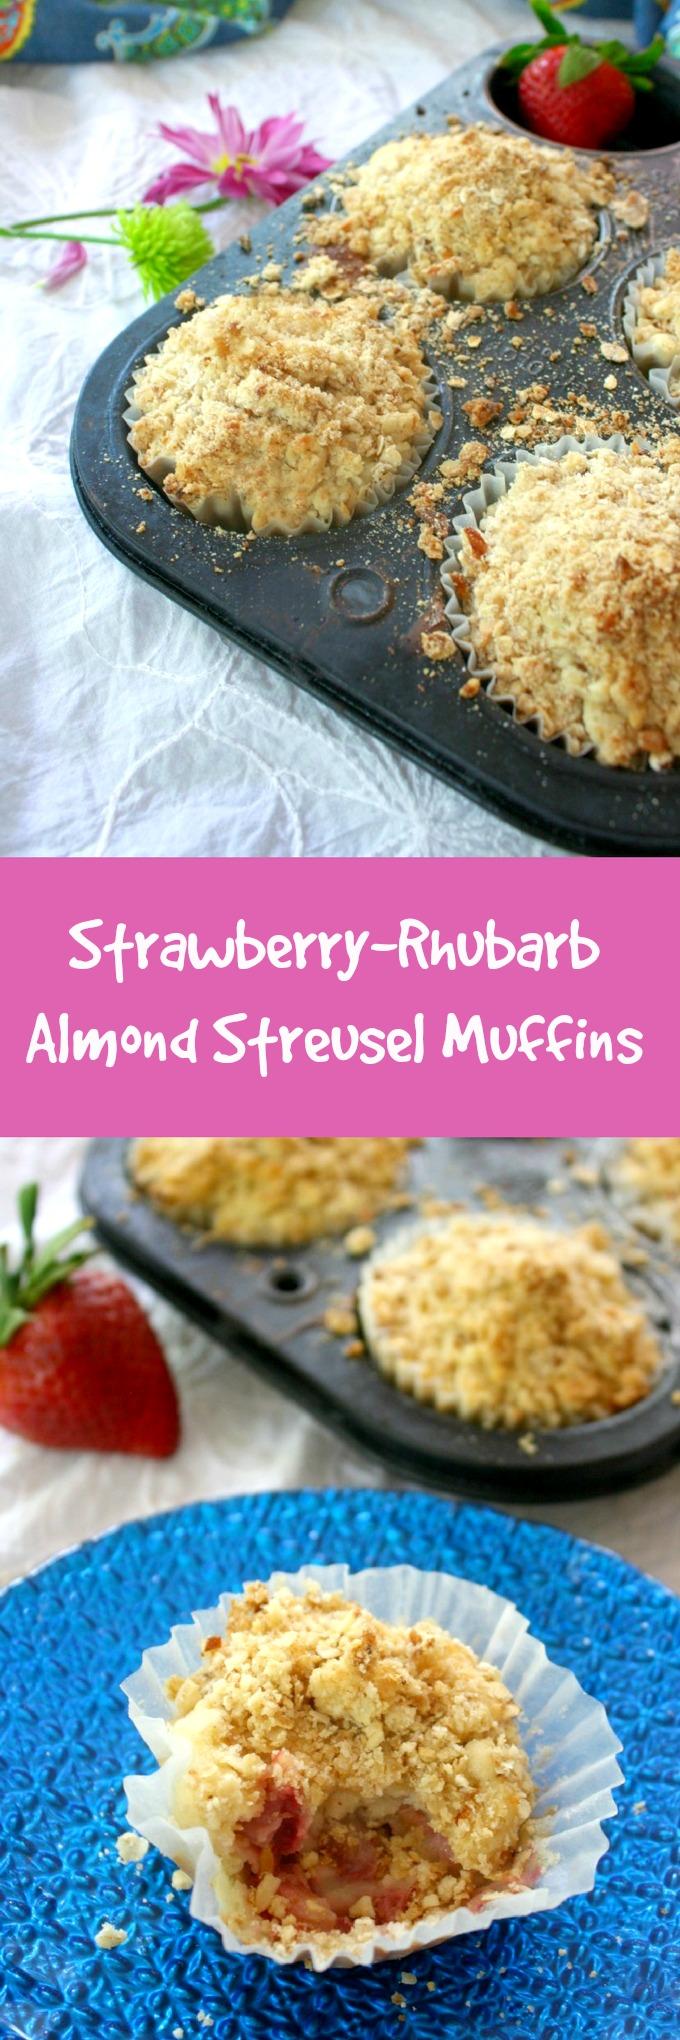 Strawberry-Rhubarb Almond Streusel Muffins